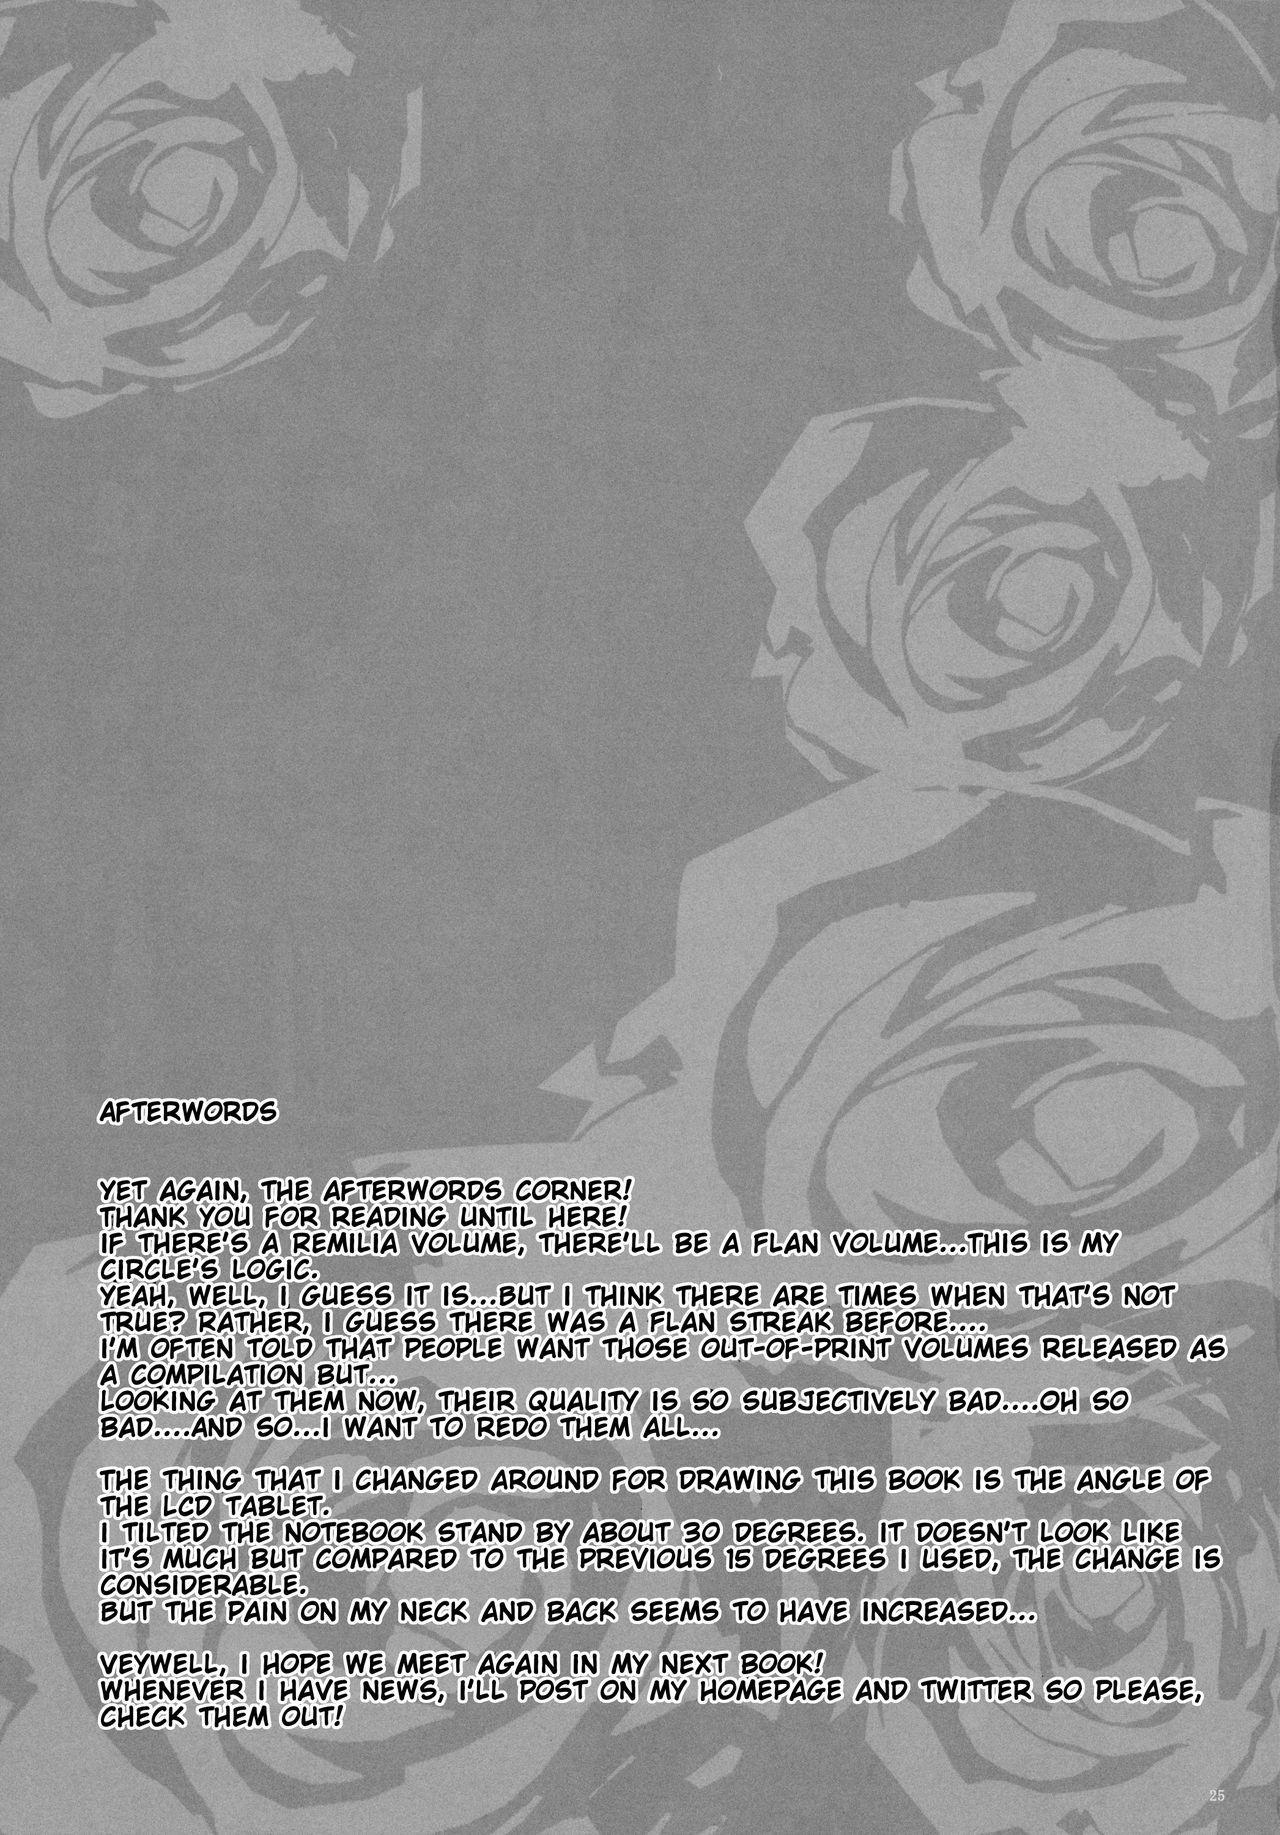 (C91) [MegaSoundOrchestra (Sanwaribiki)] Gensou Enkou -Flandre- Shoku (Touhou Project) [English] [SMDC] 24